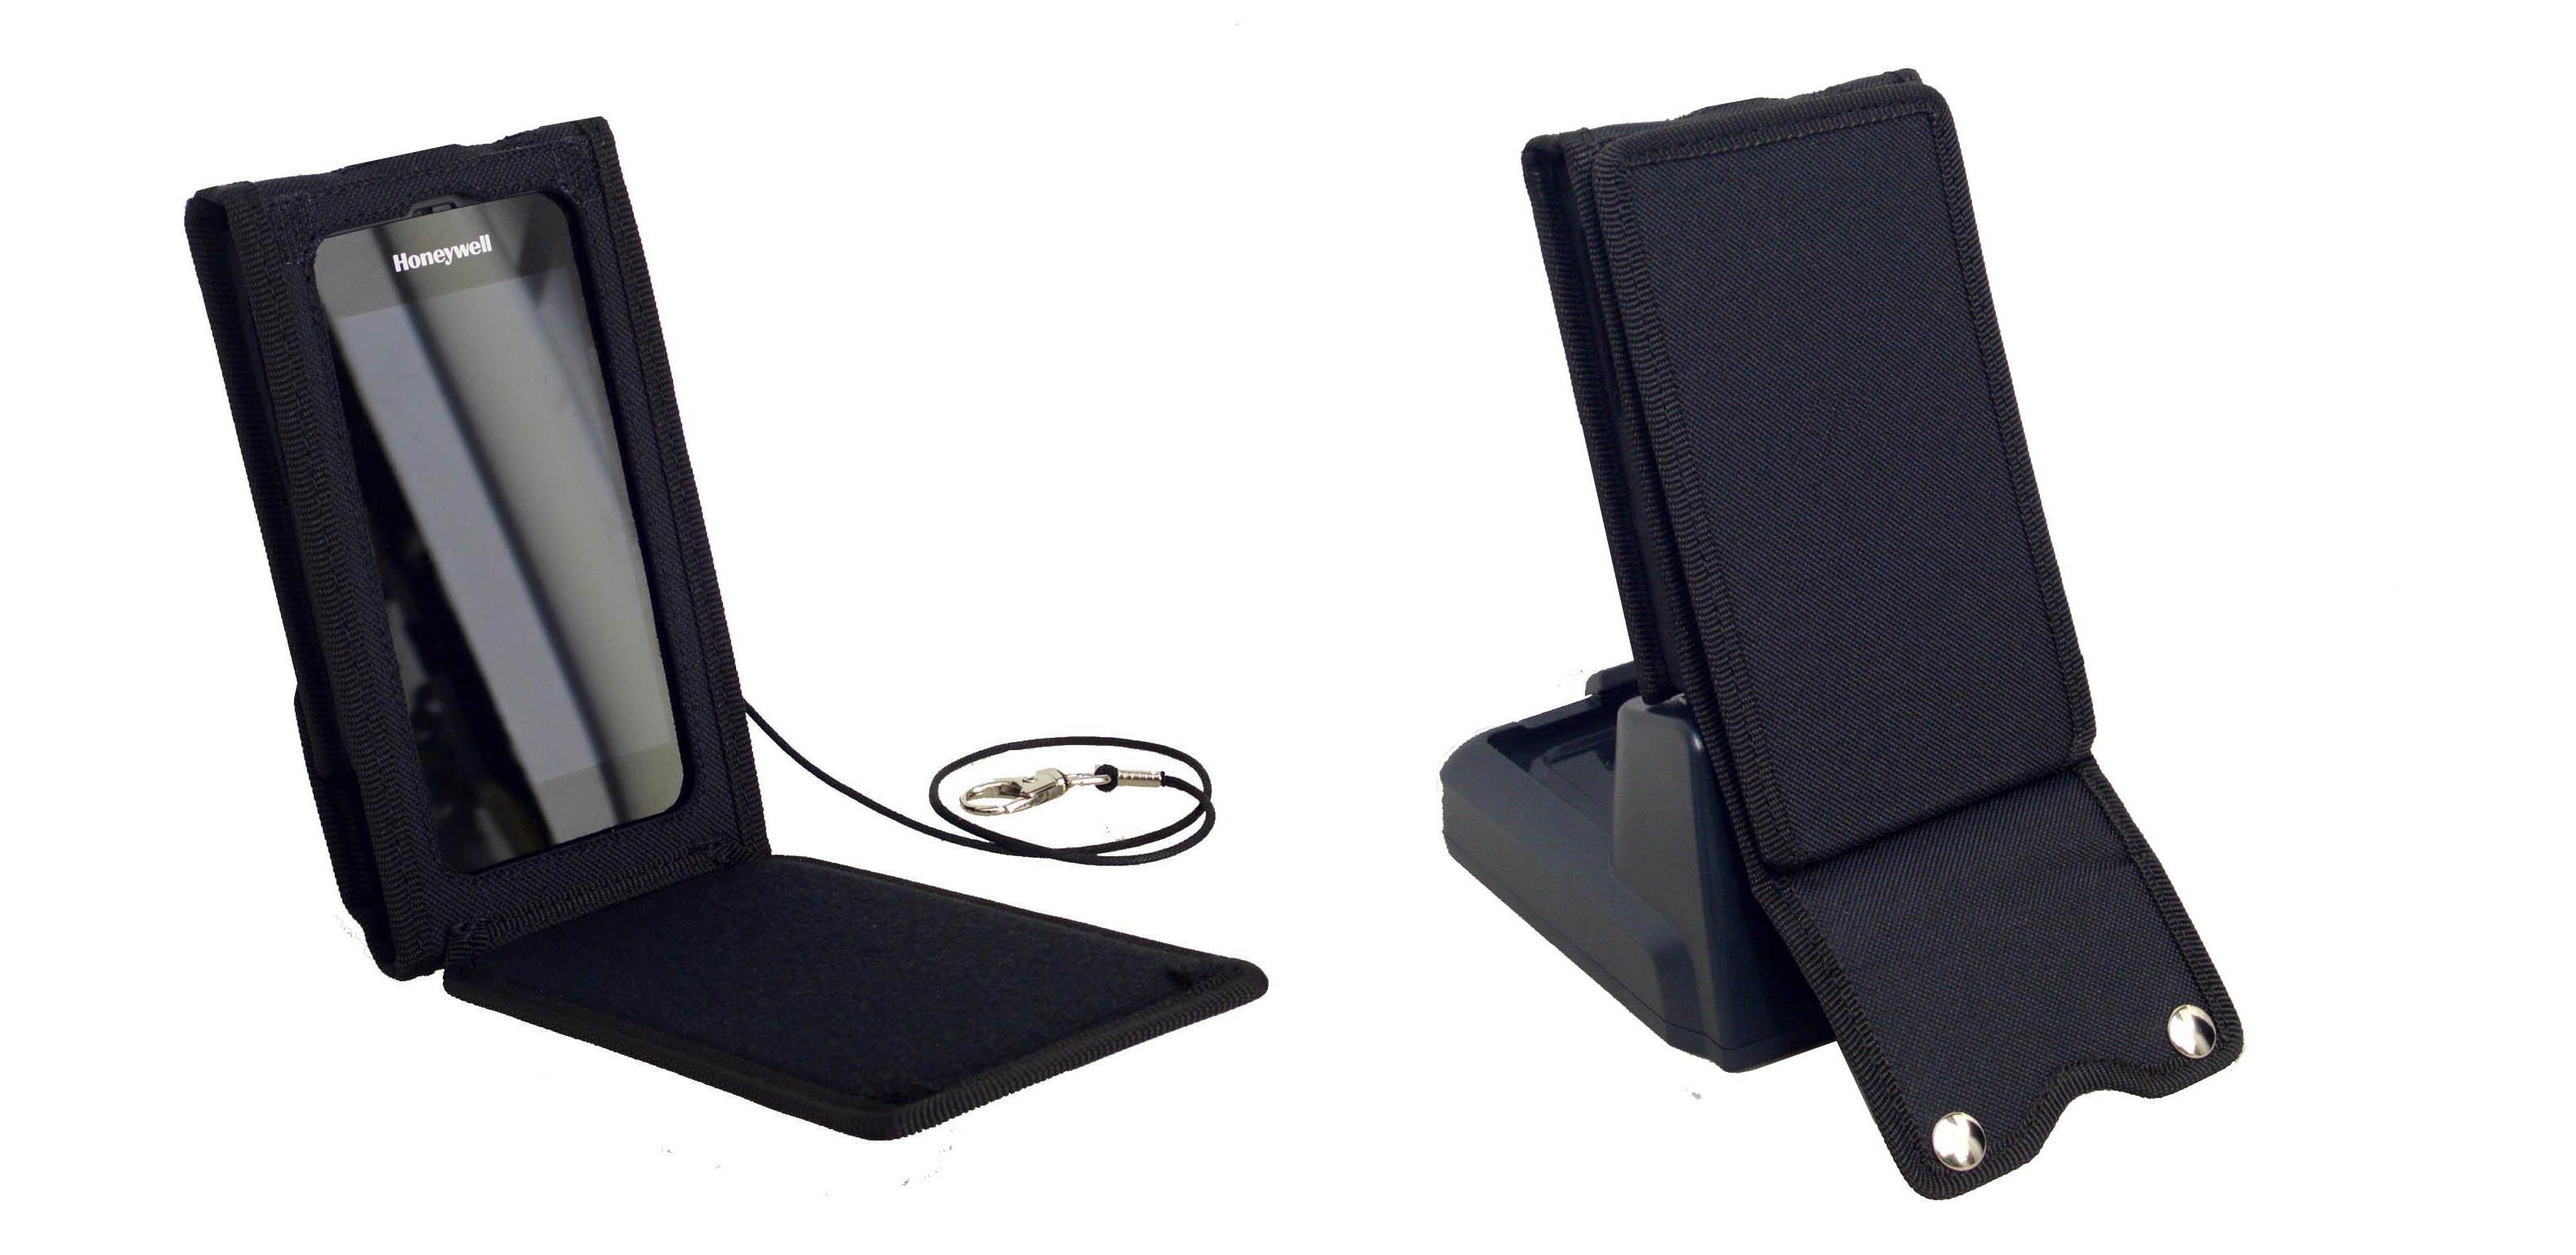 Honeywell Dolphin CT50 Nylon Case